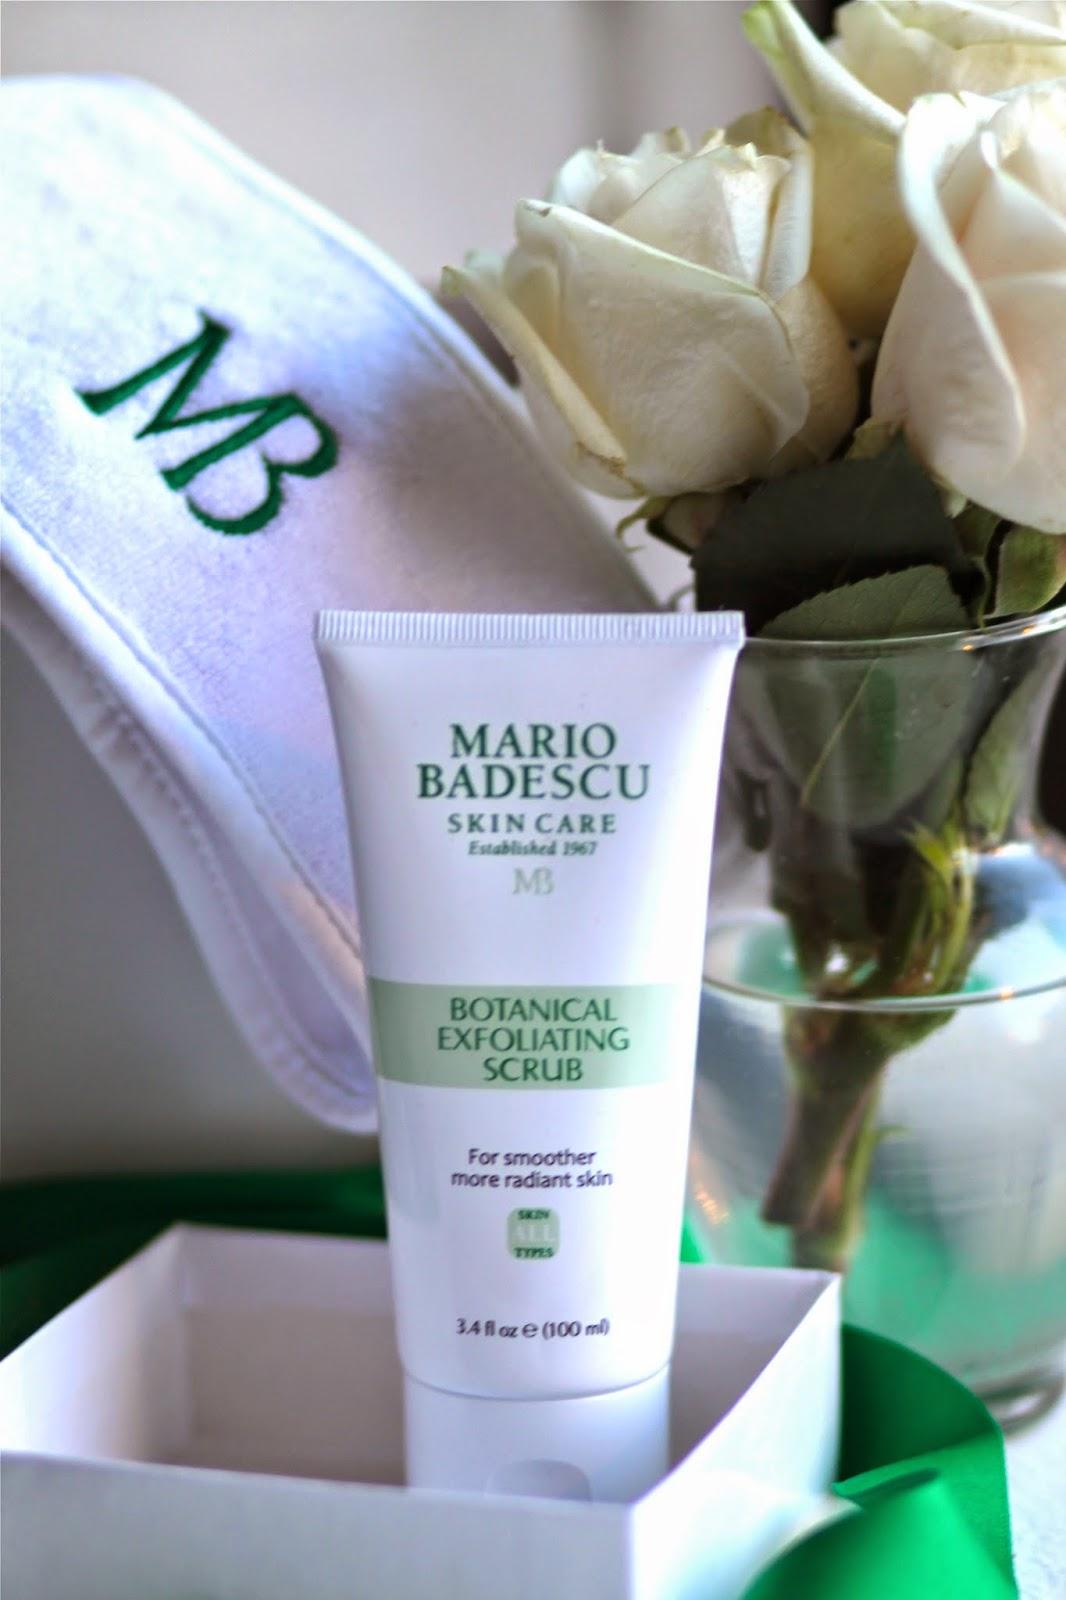 Mario, Badescu, skin, care, botanical, exfoliating, scrub